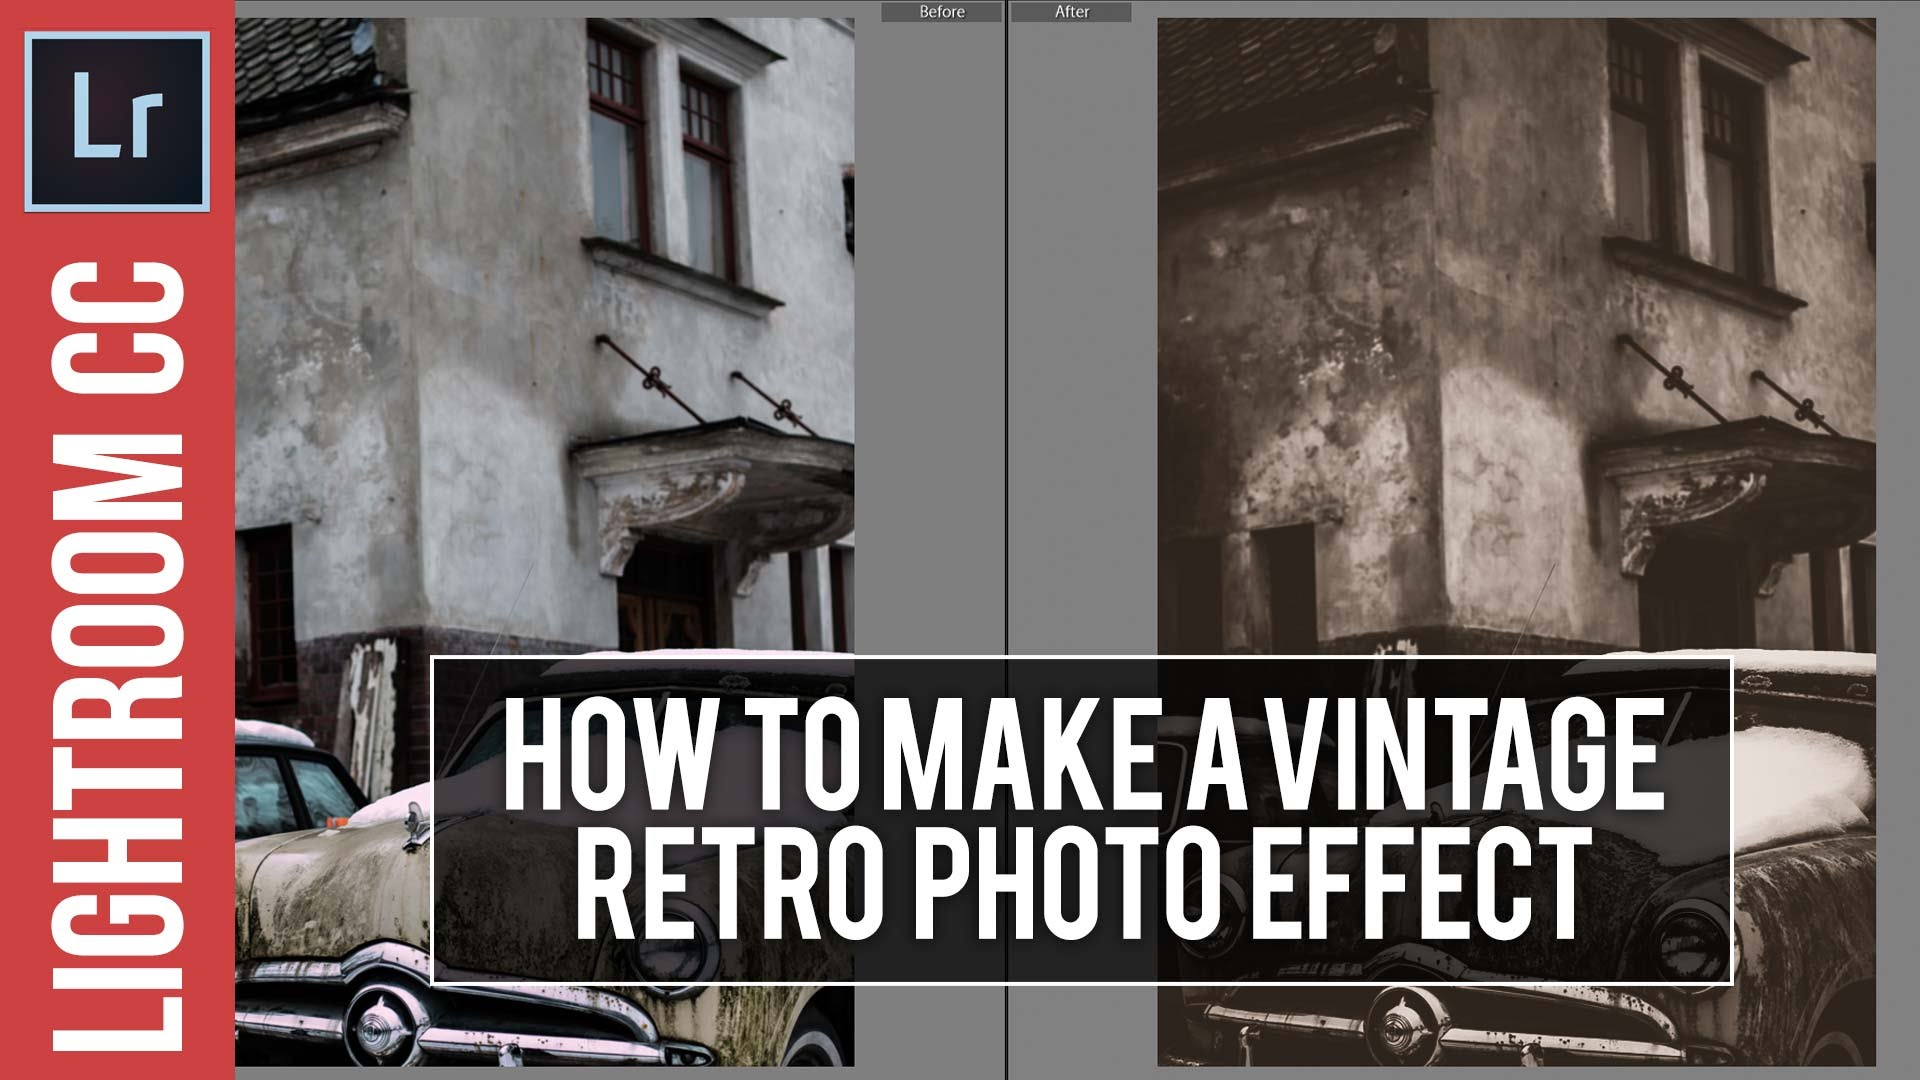 Lightroom Tutorial: Retro / Vintage Photo Effect & Free Preset